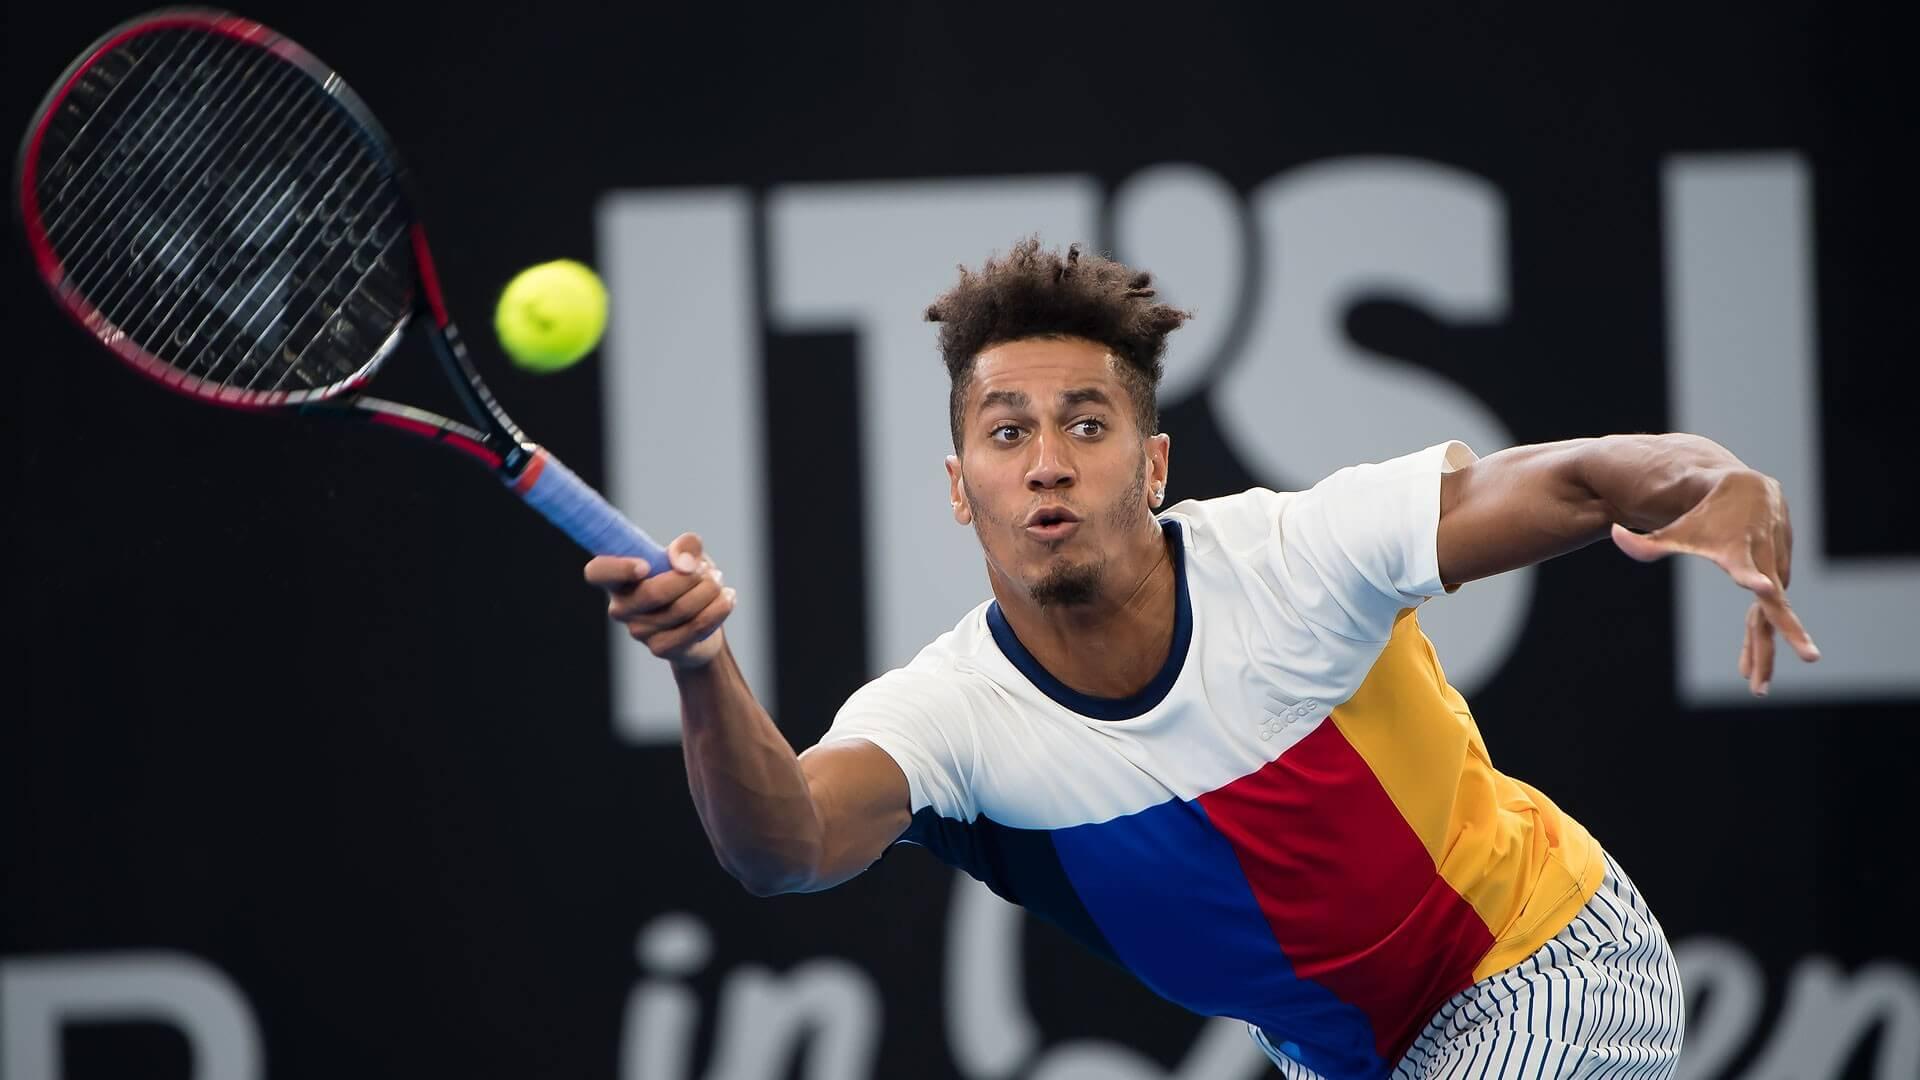 Сингапур. ATP. Мужчины. 1/16 финала. Майкл Ммо — Есихито Нисиока. 22.02.2021 г